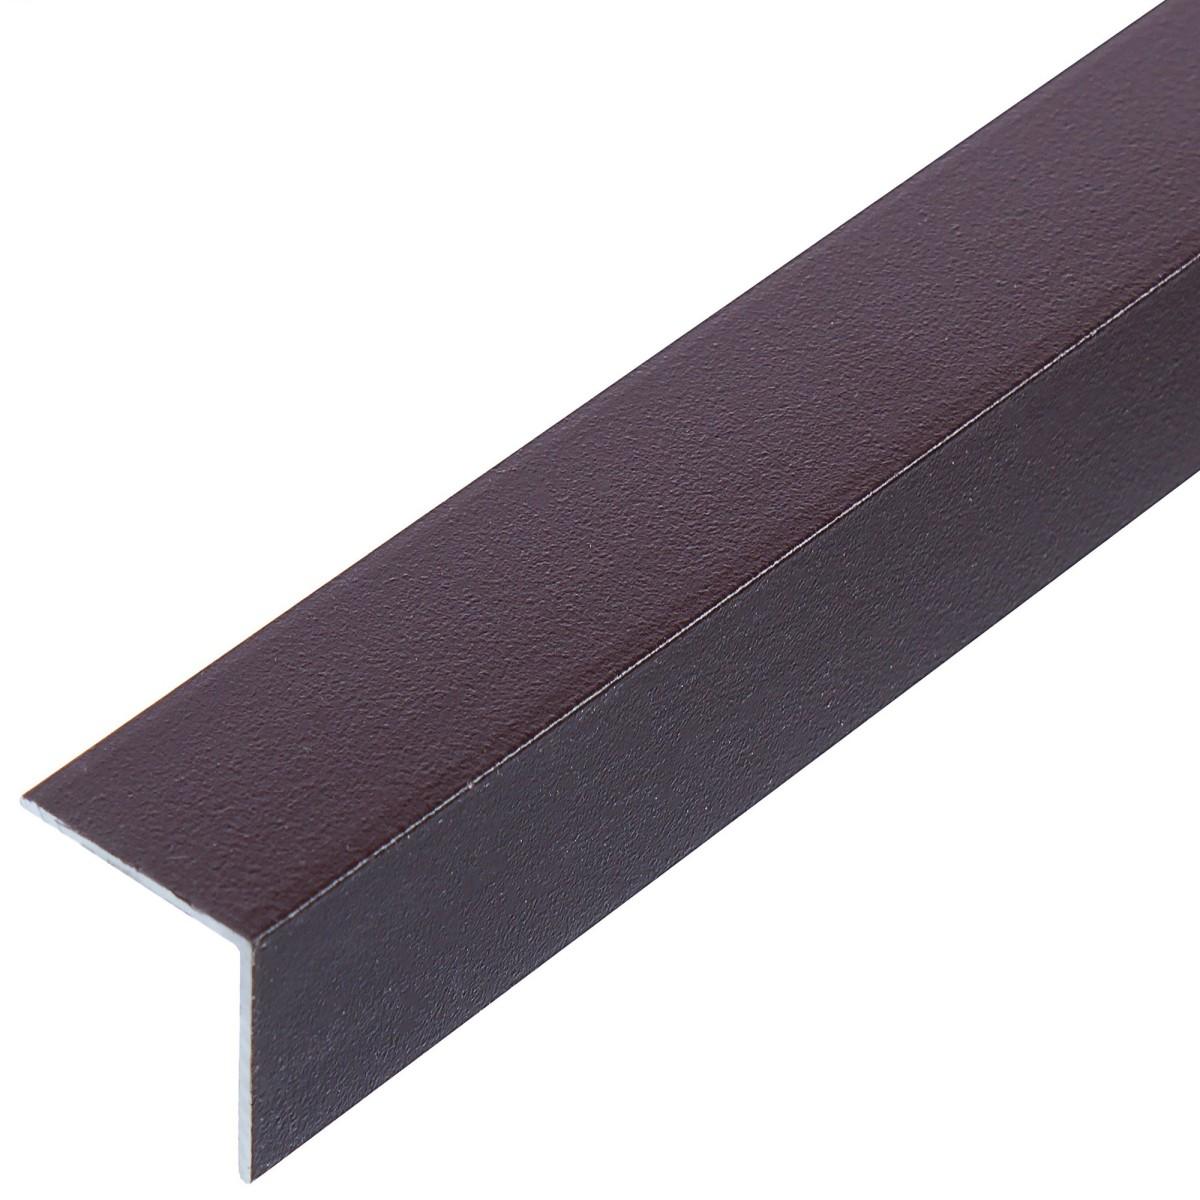 Уголок QuickStick 20x20x1x2000 мм алюминий цвет медь